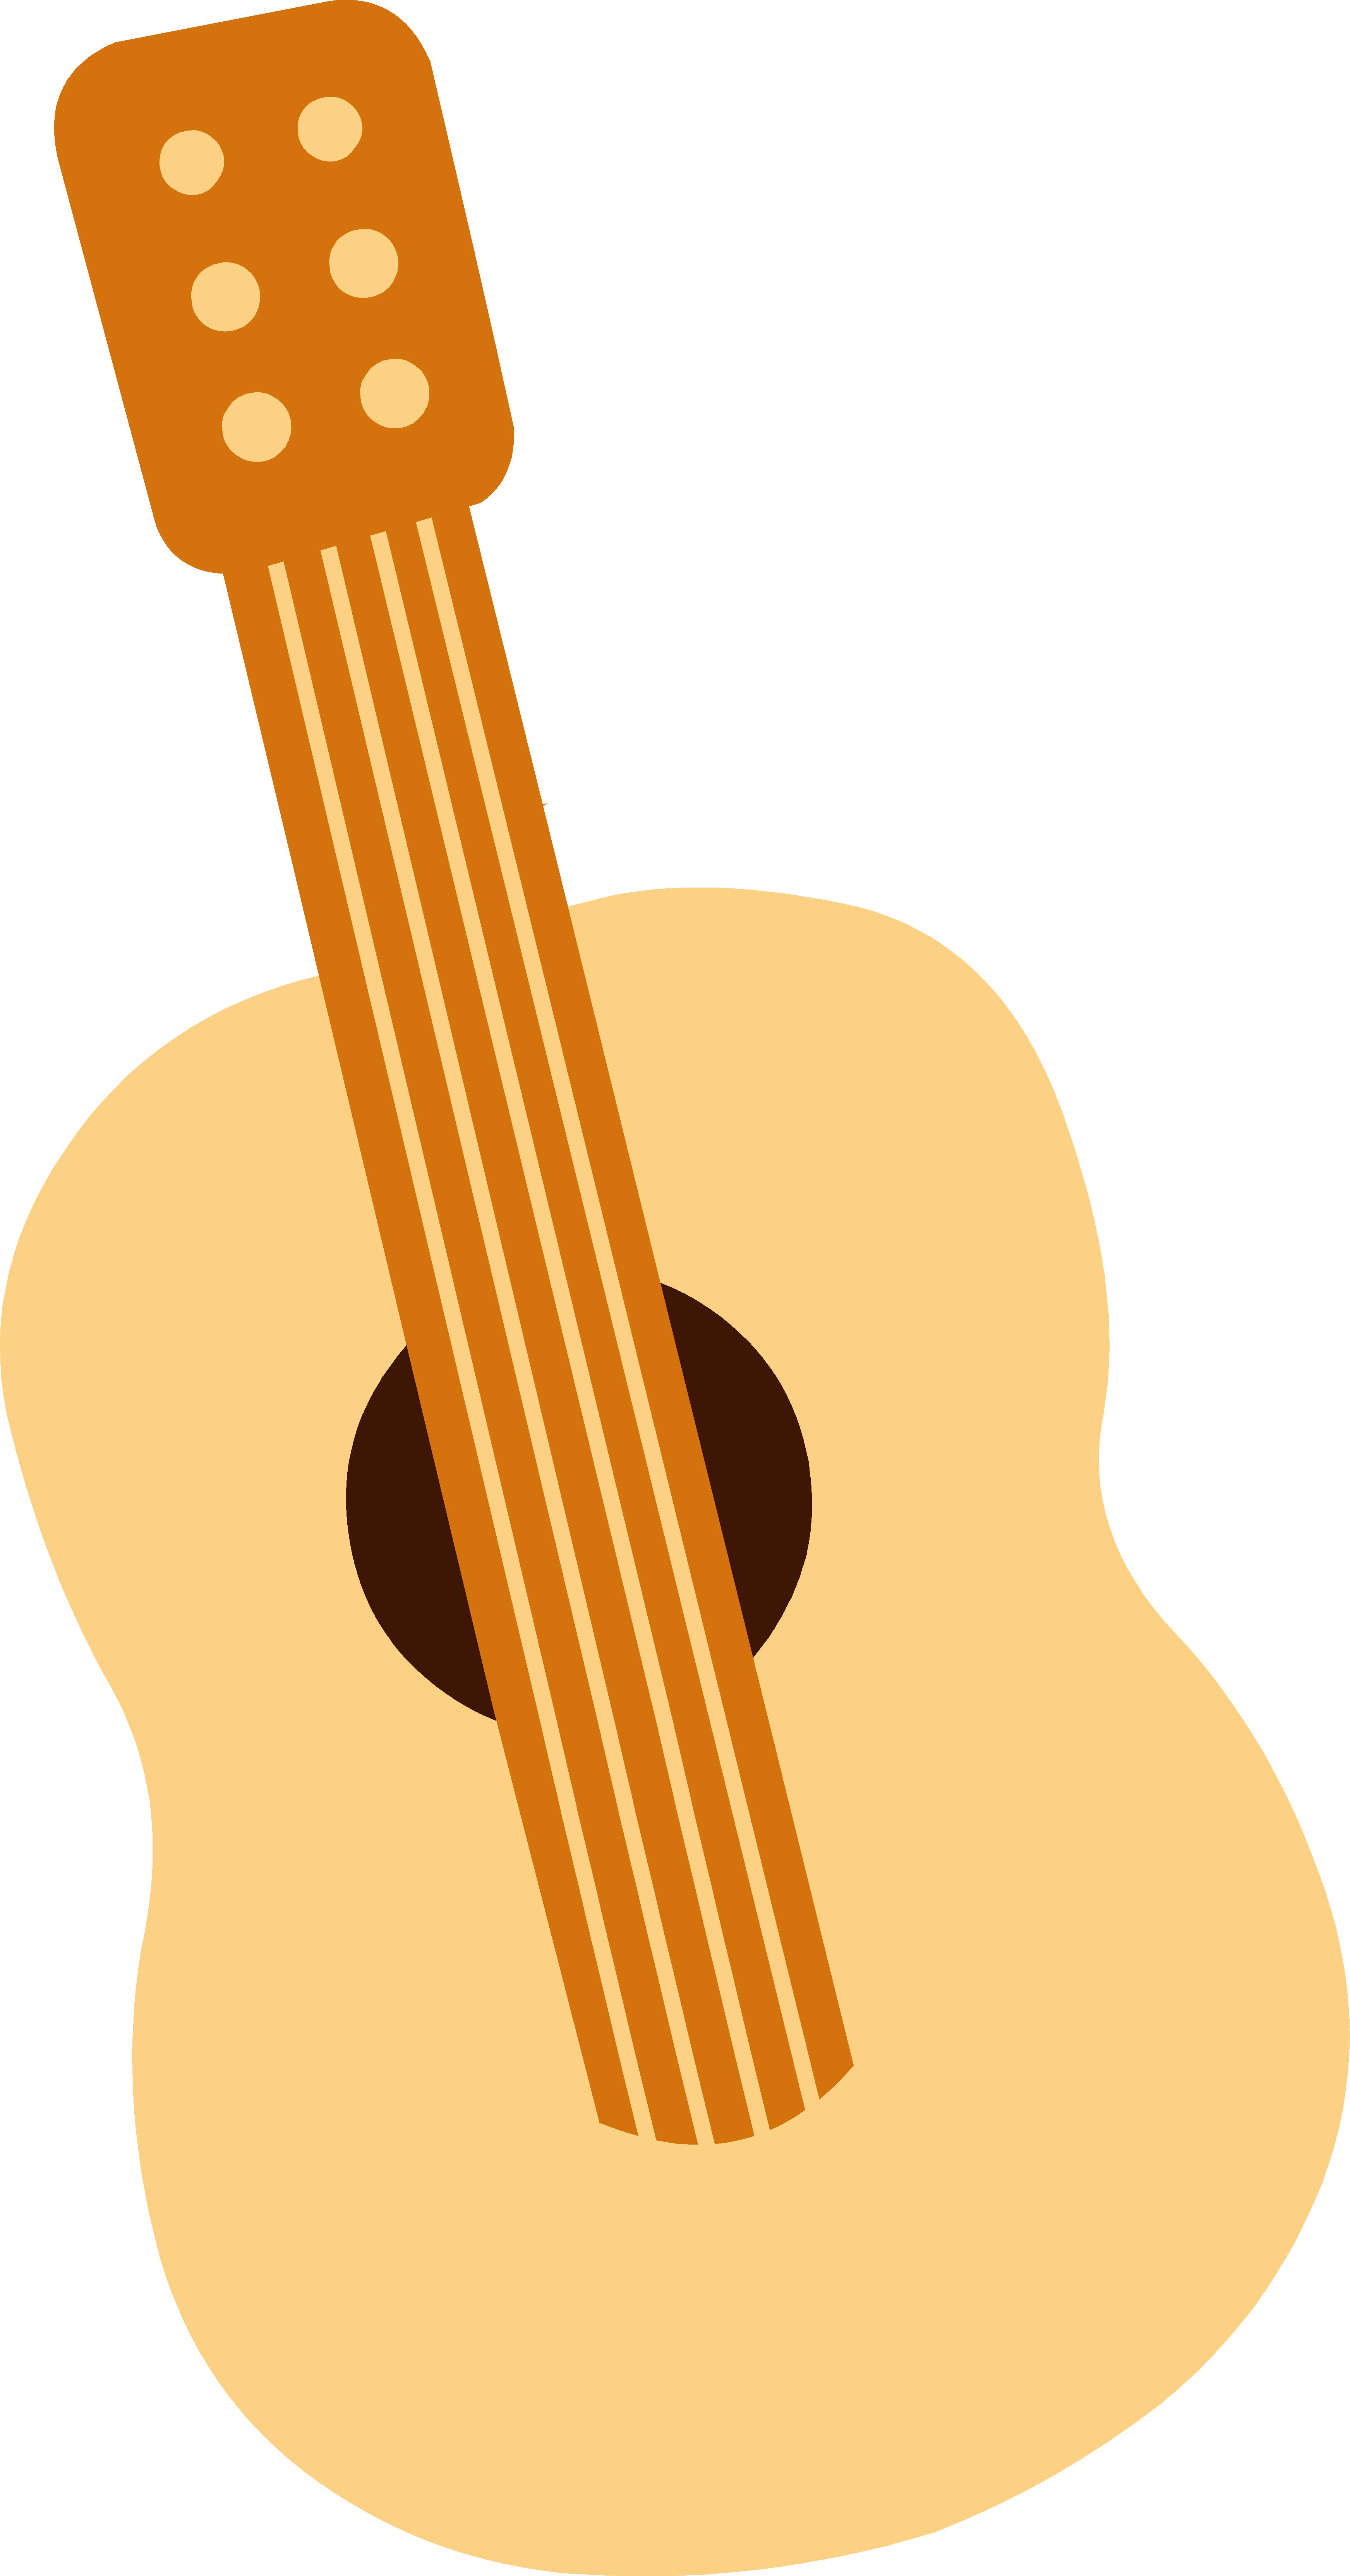 Music snowflake clipart svg royalty free download Cute Mini Toy Guitar Clipart Free | jokingart.com Guitar Clipart svg royalty free download